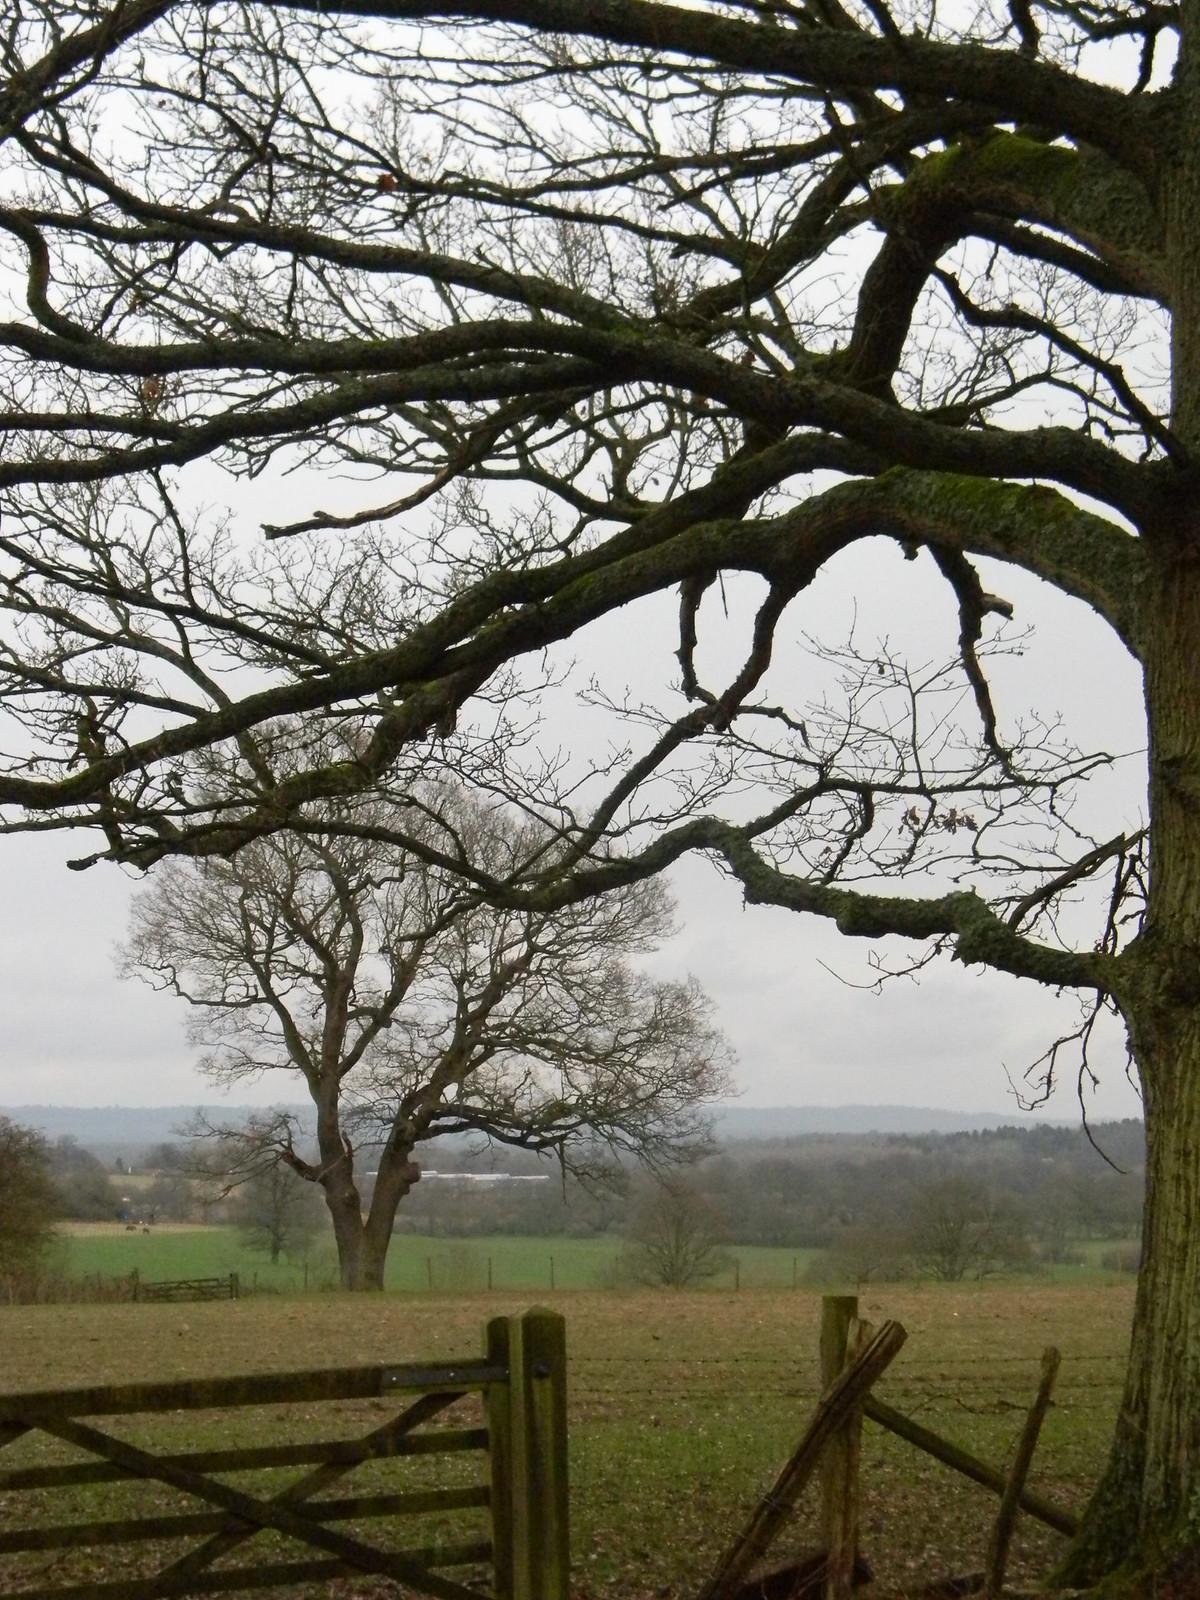 Near tree, far tree Cowden to Hever